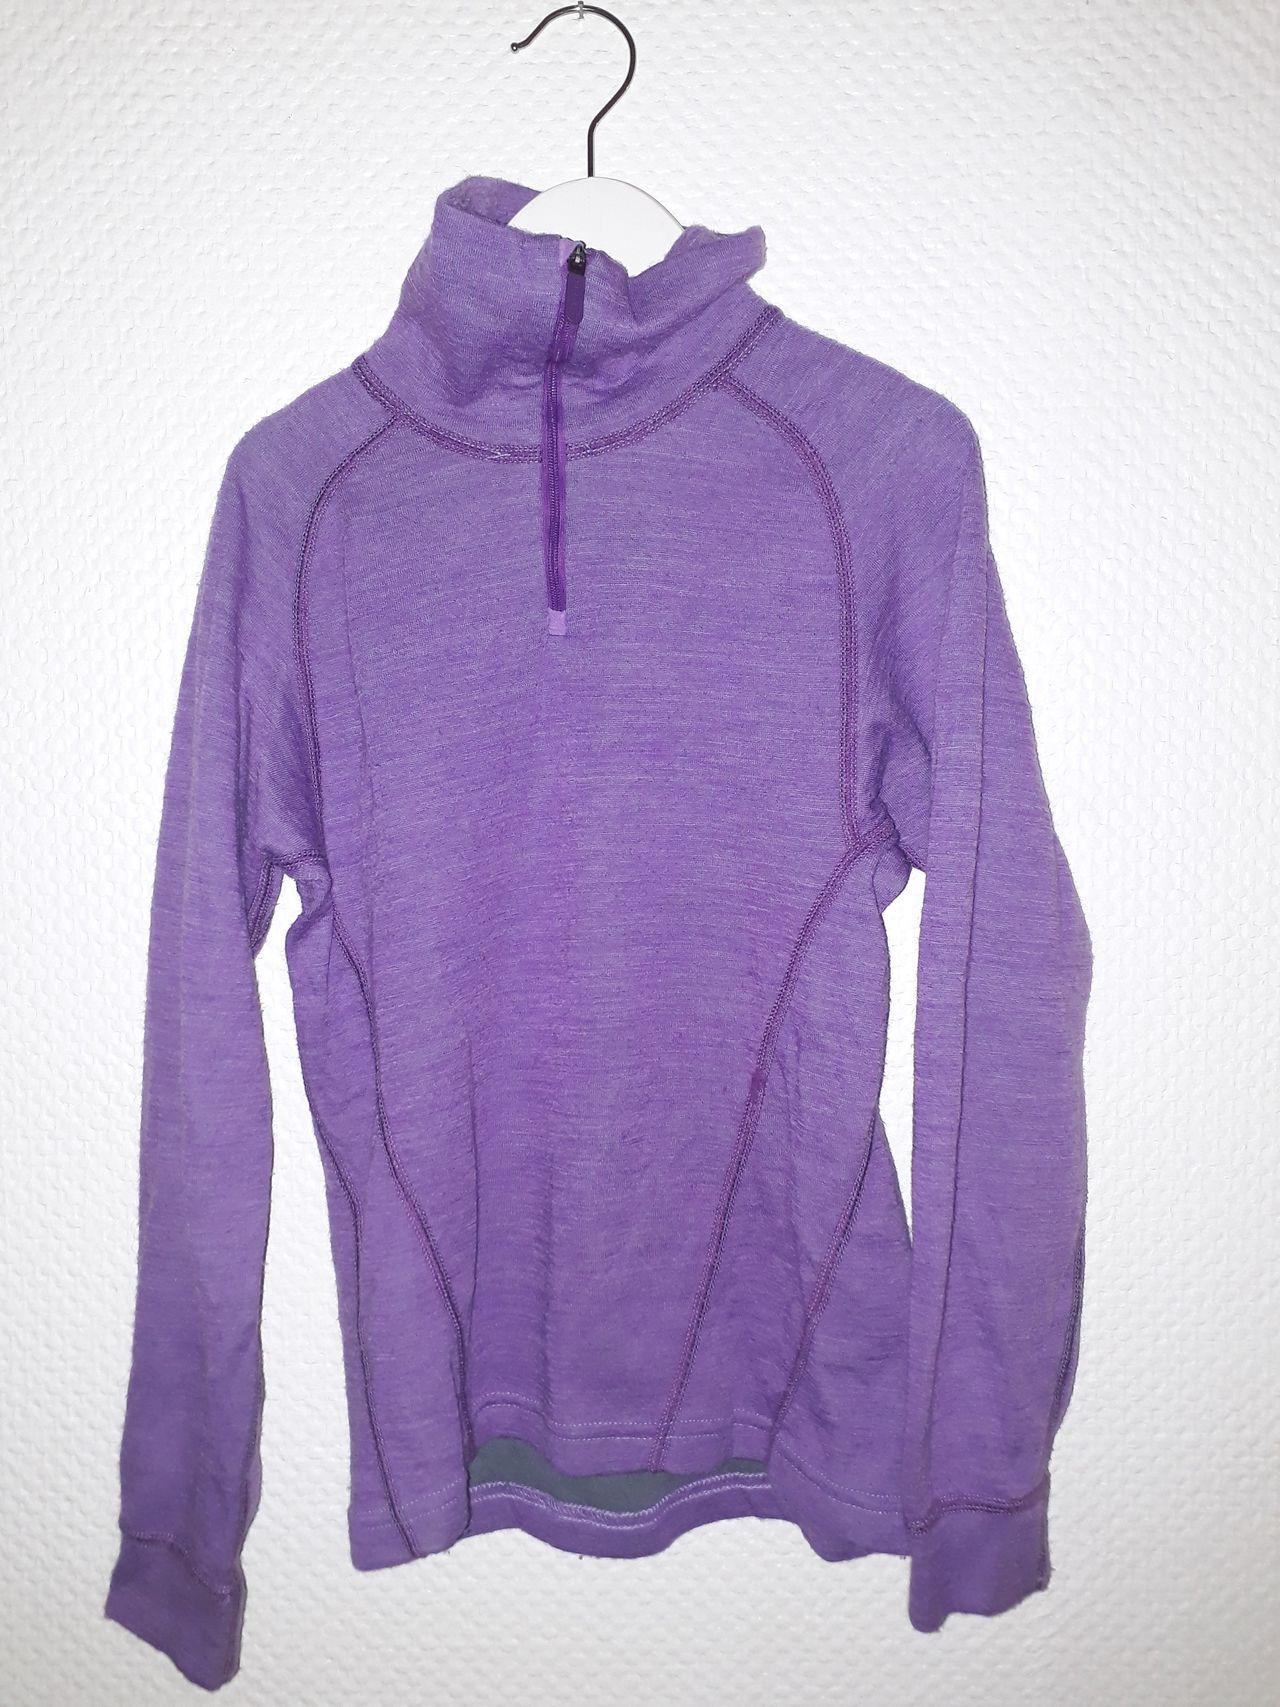 Devold jakke i ull str. 12 år | FINN.no